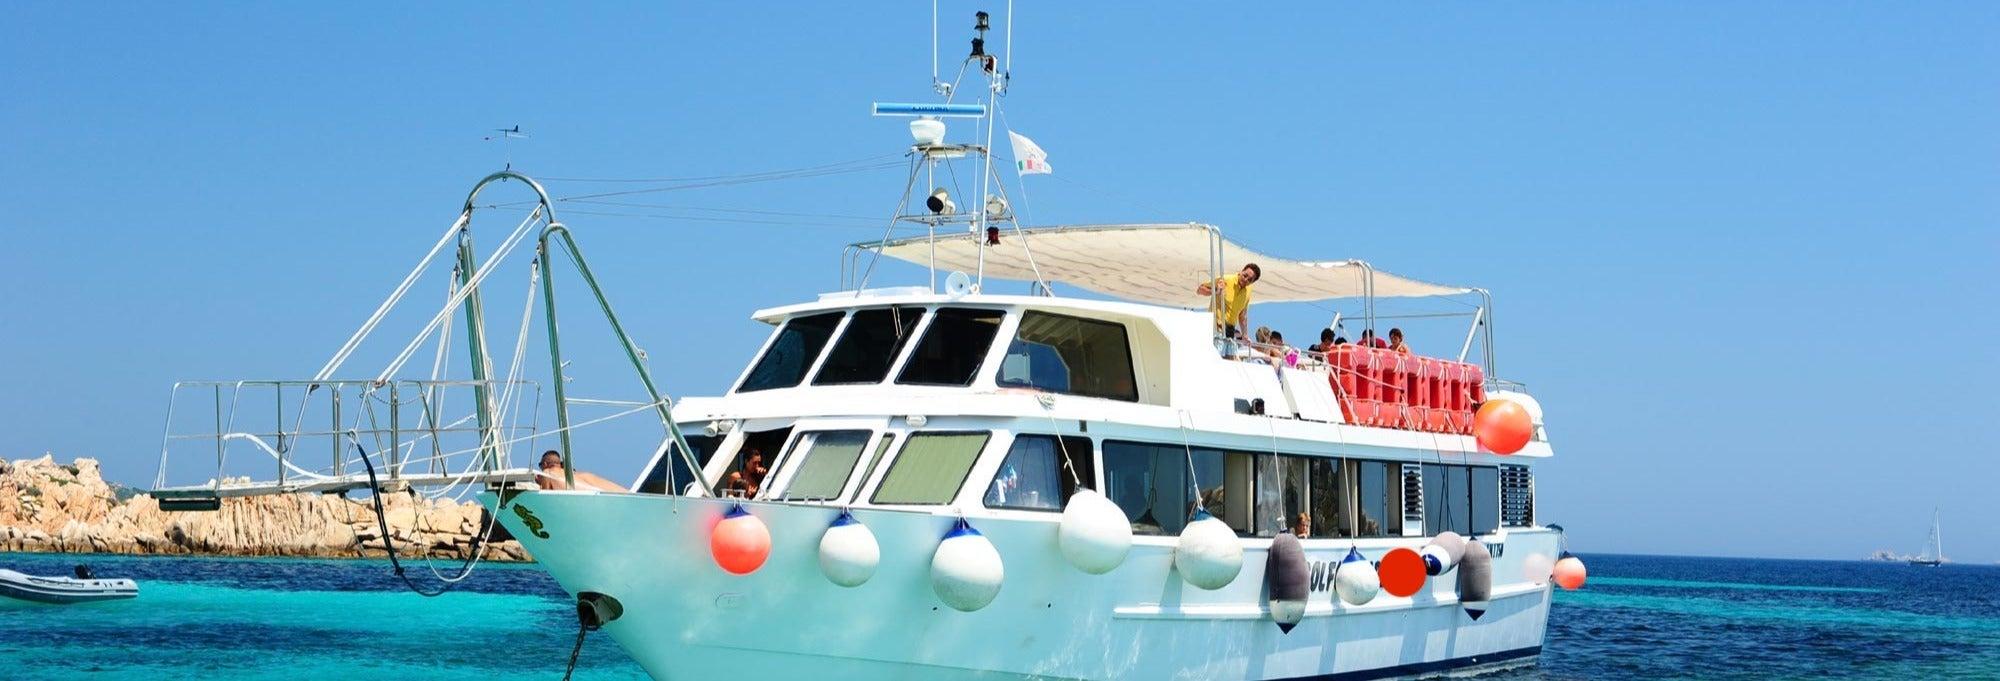 Cruzeiros pelas ilhas de La Maddalena